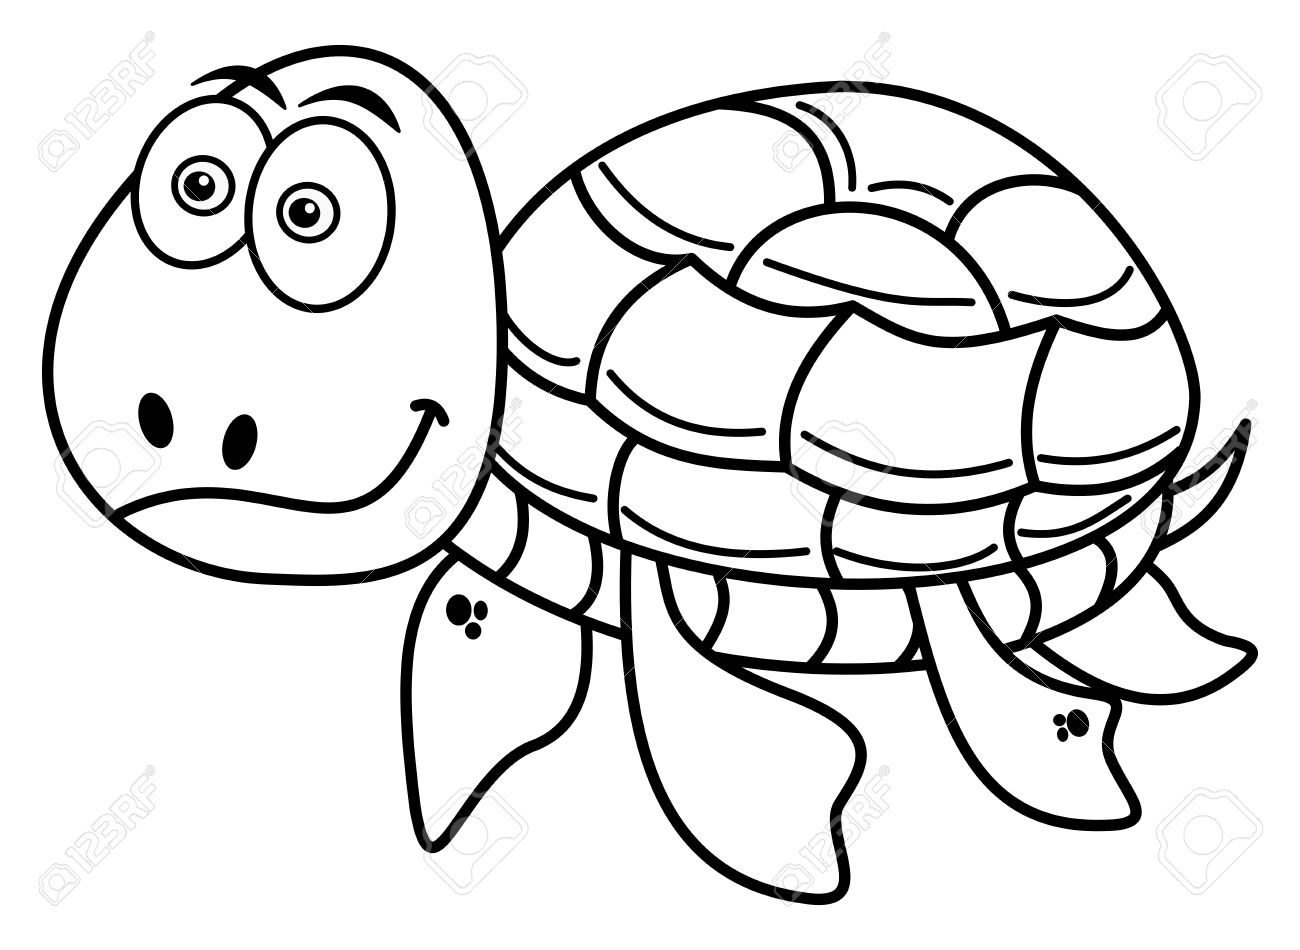 Tortugas Para Colorear. Printable Ninja Turtle Para Colorear With ...